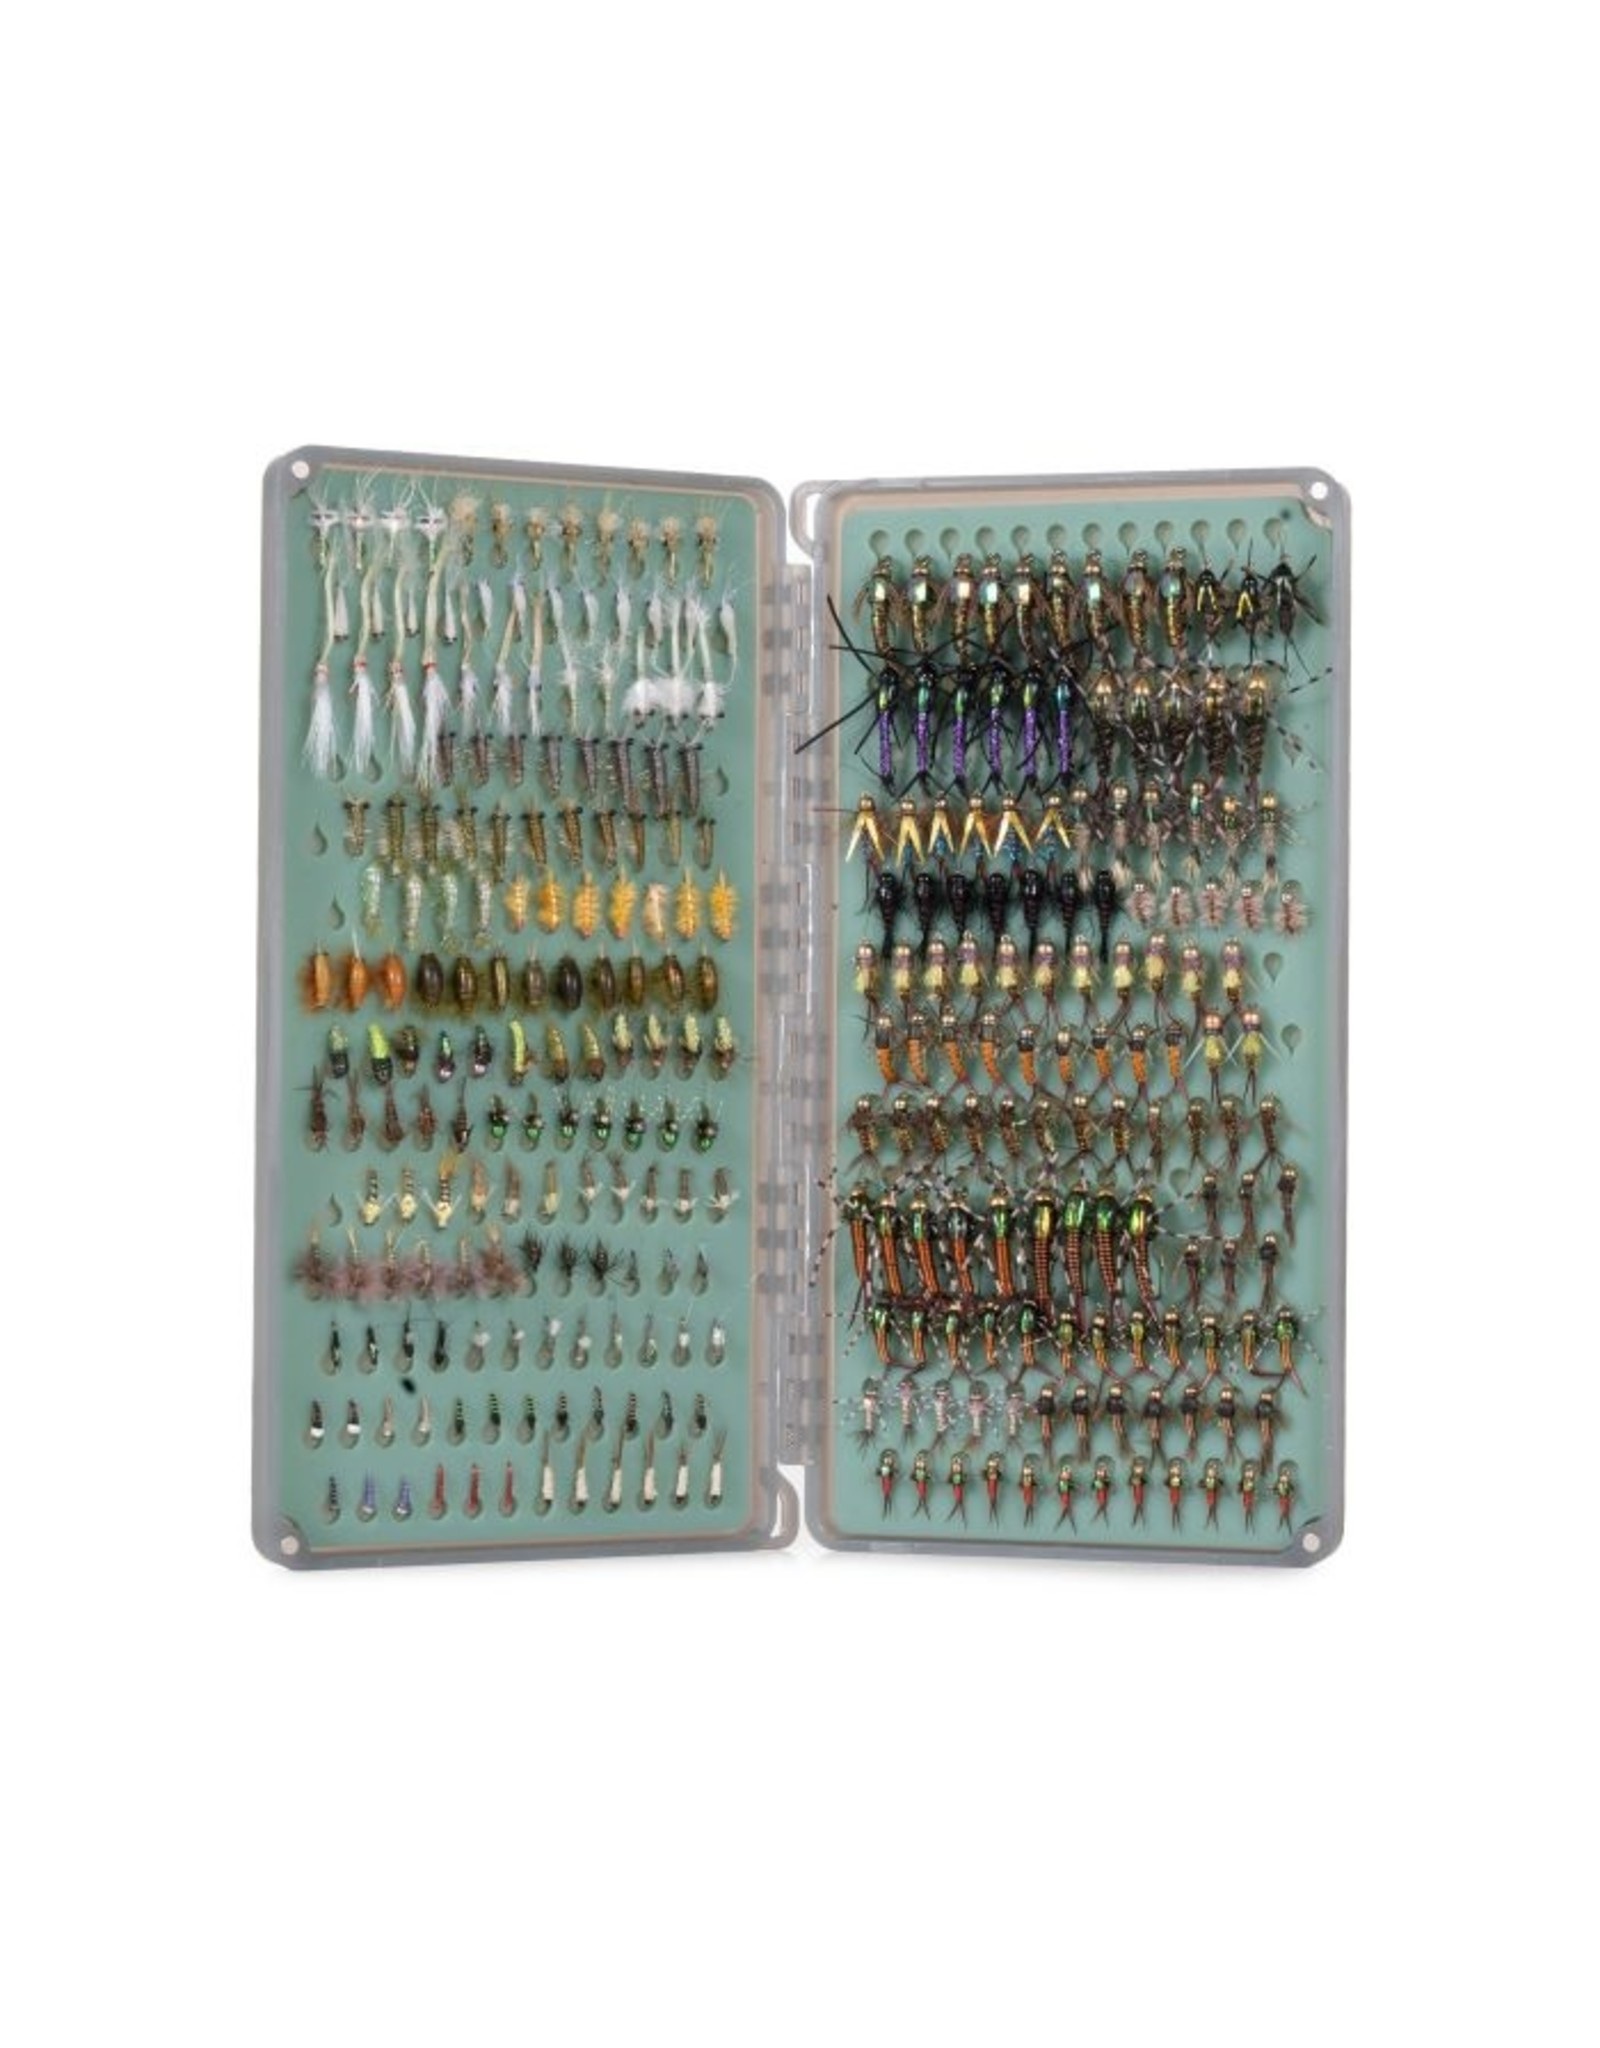 Fishpond Fishpond - Tacky Original Fly Box 2X